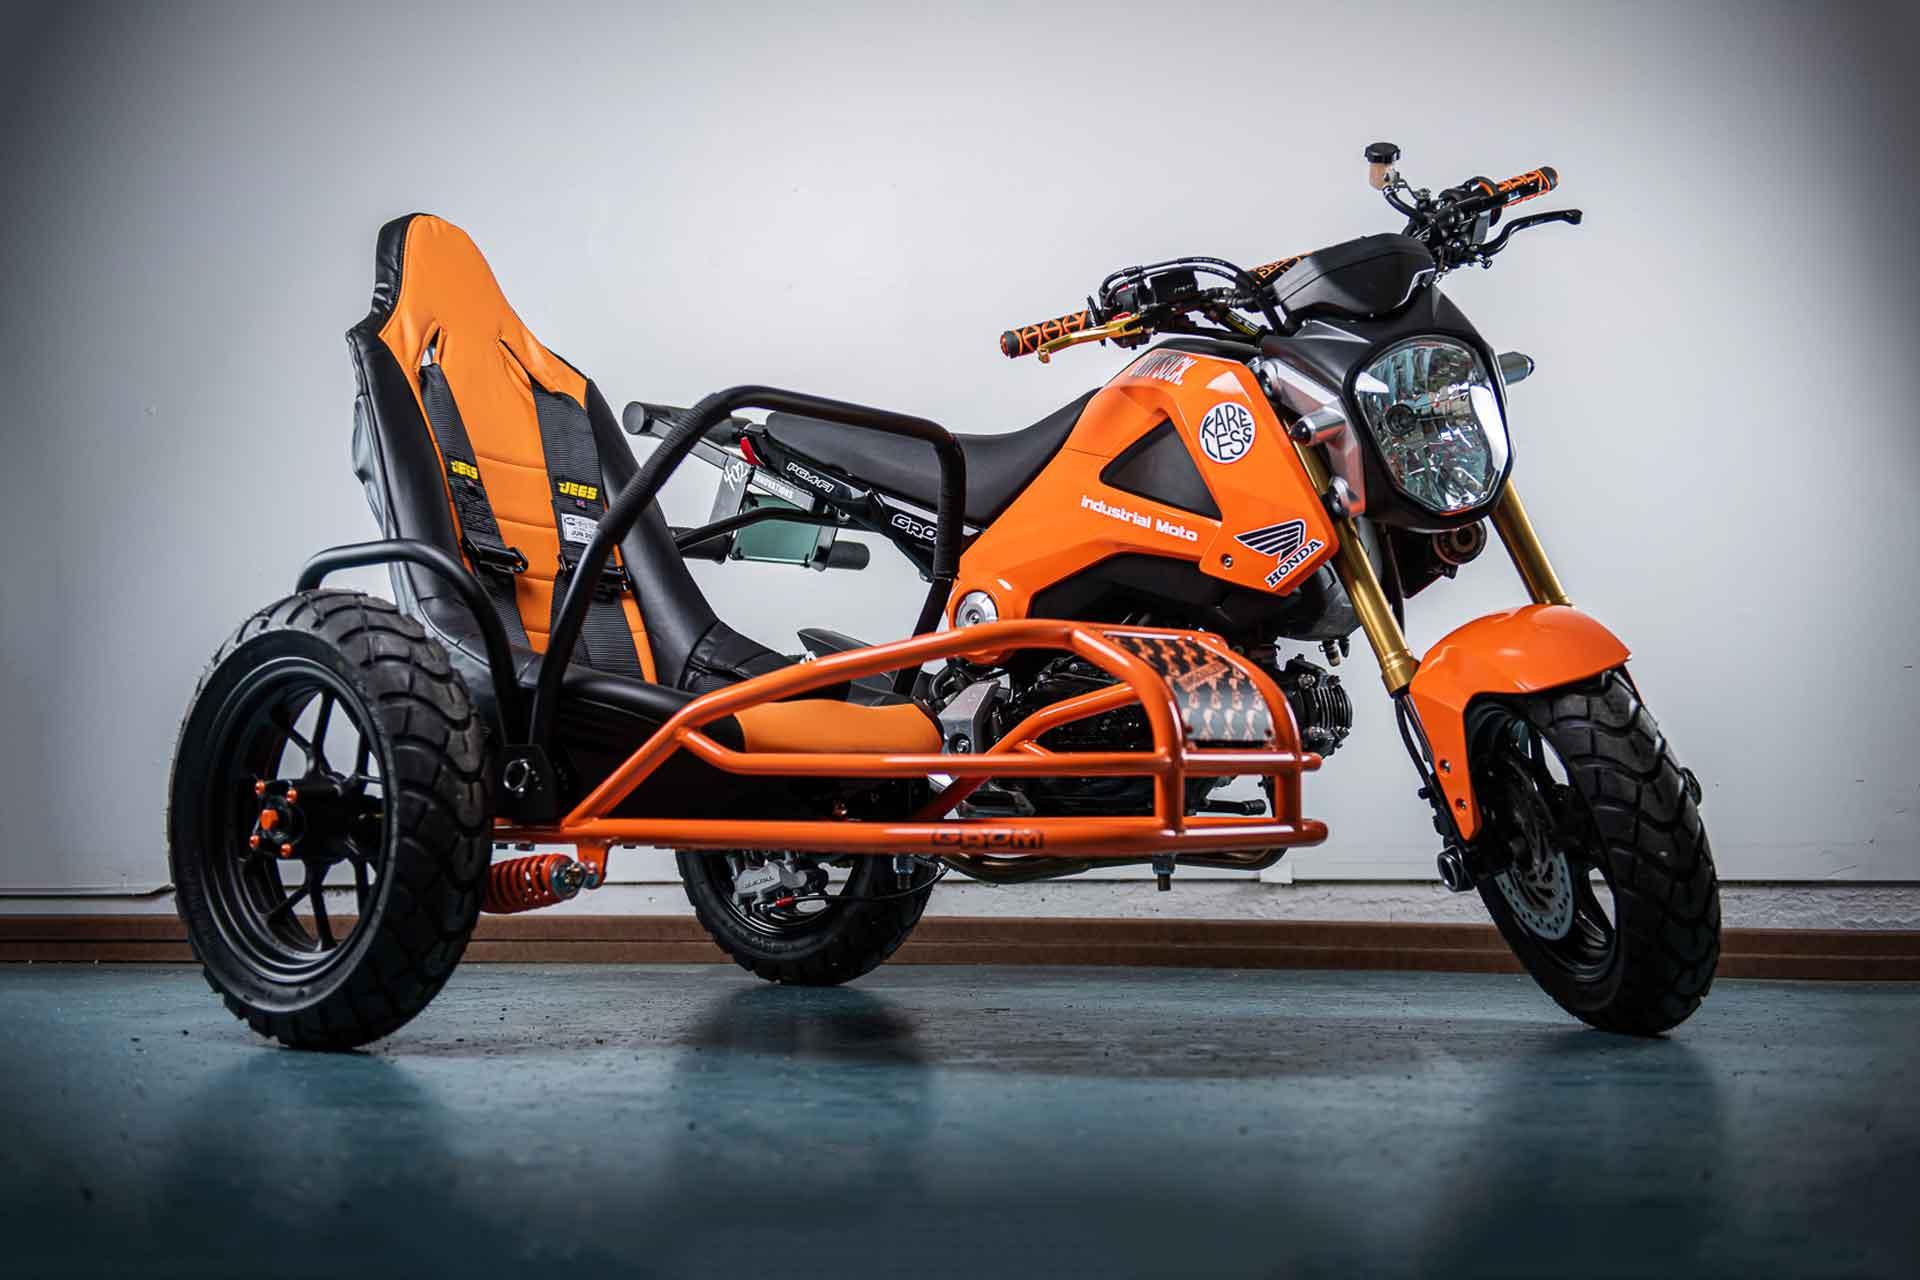 Industrial Moto Project Angel Honda Grom Motorcycle